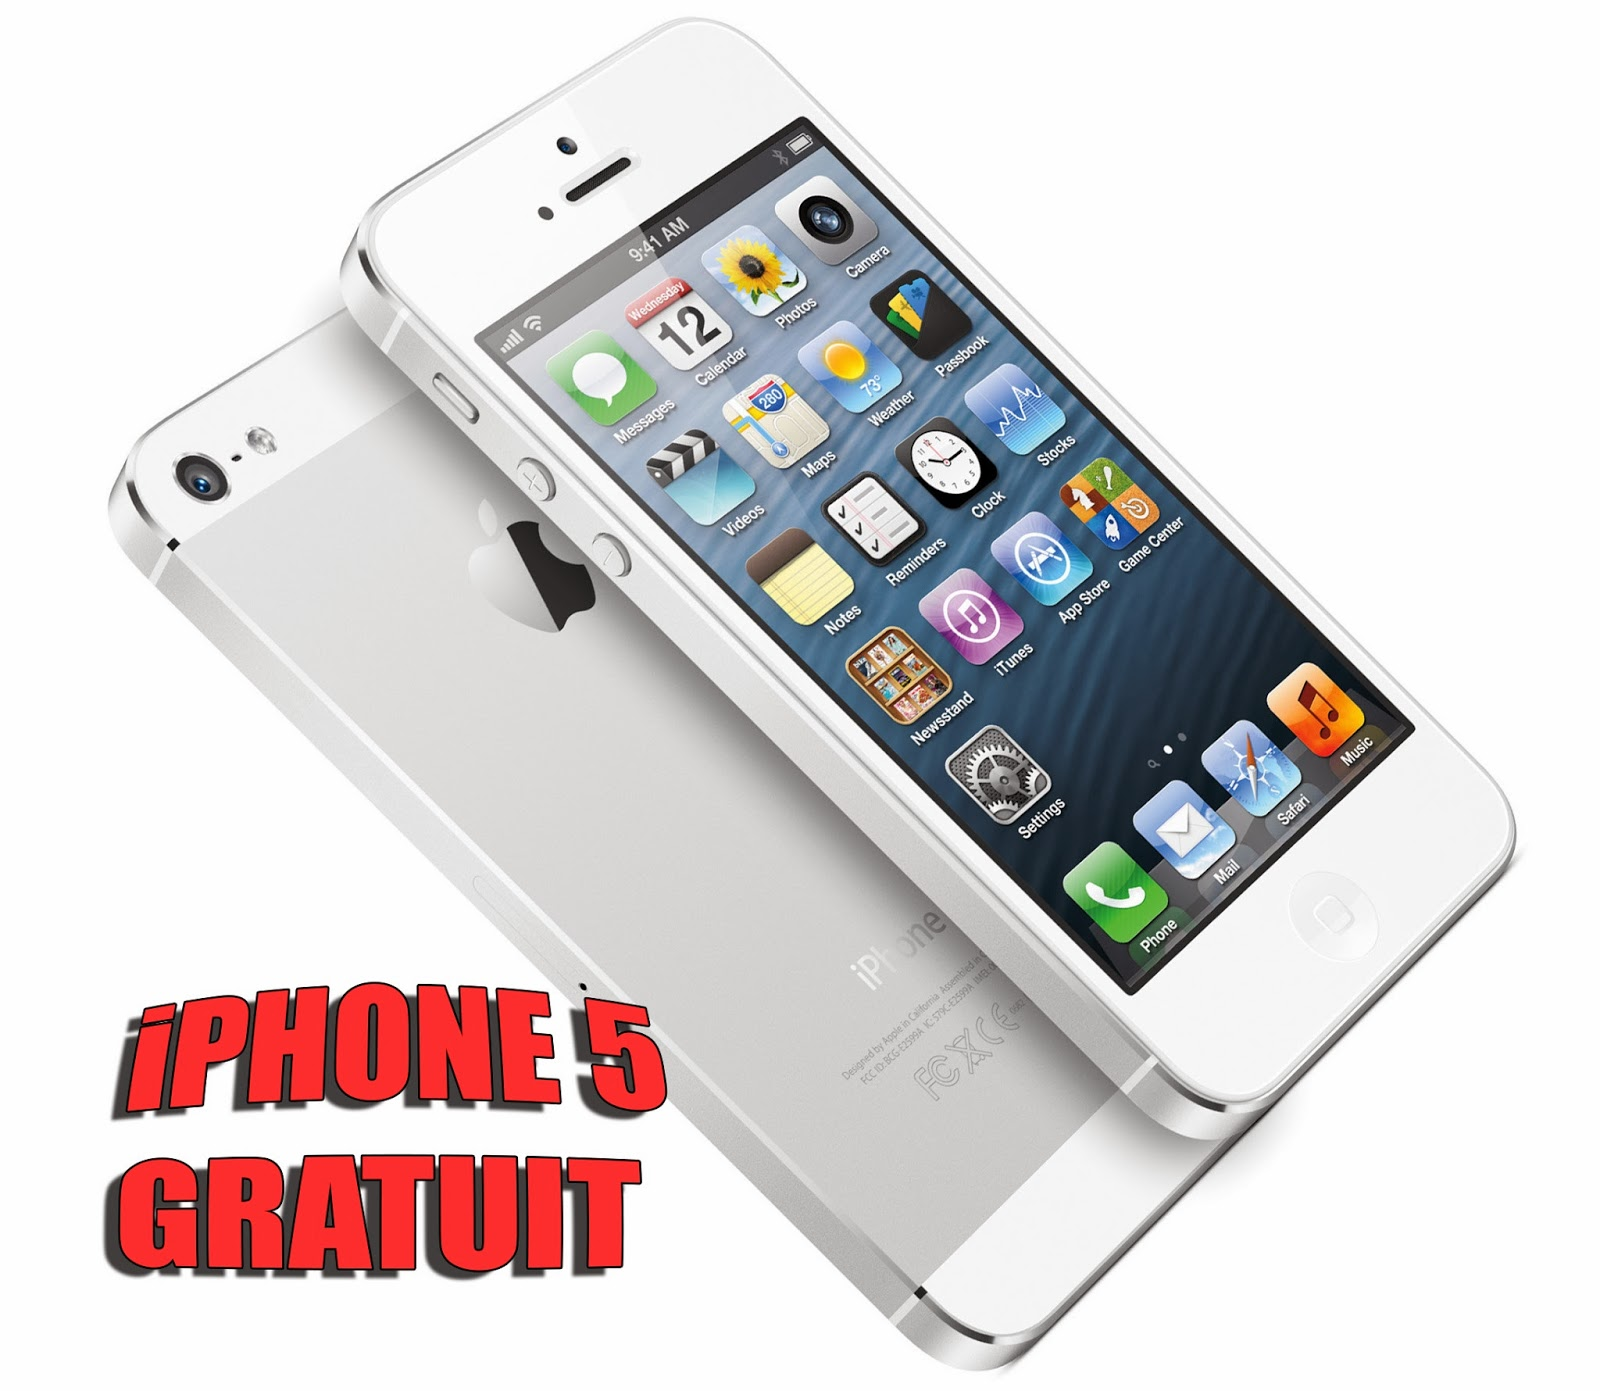 gagner un iphone 6